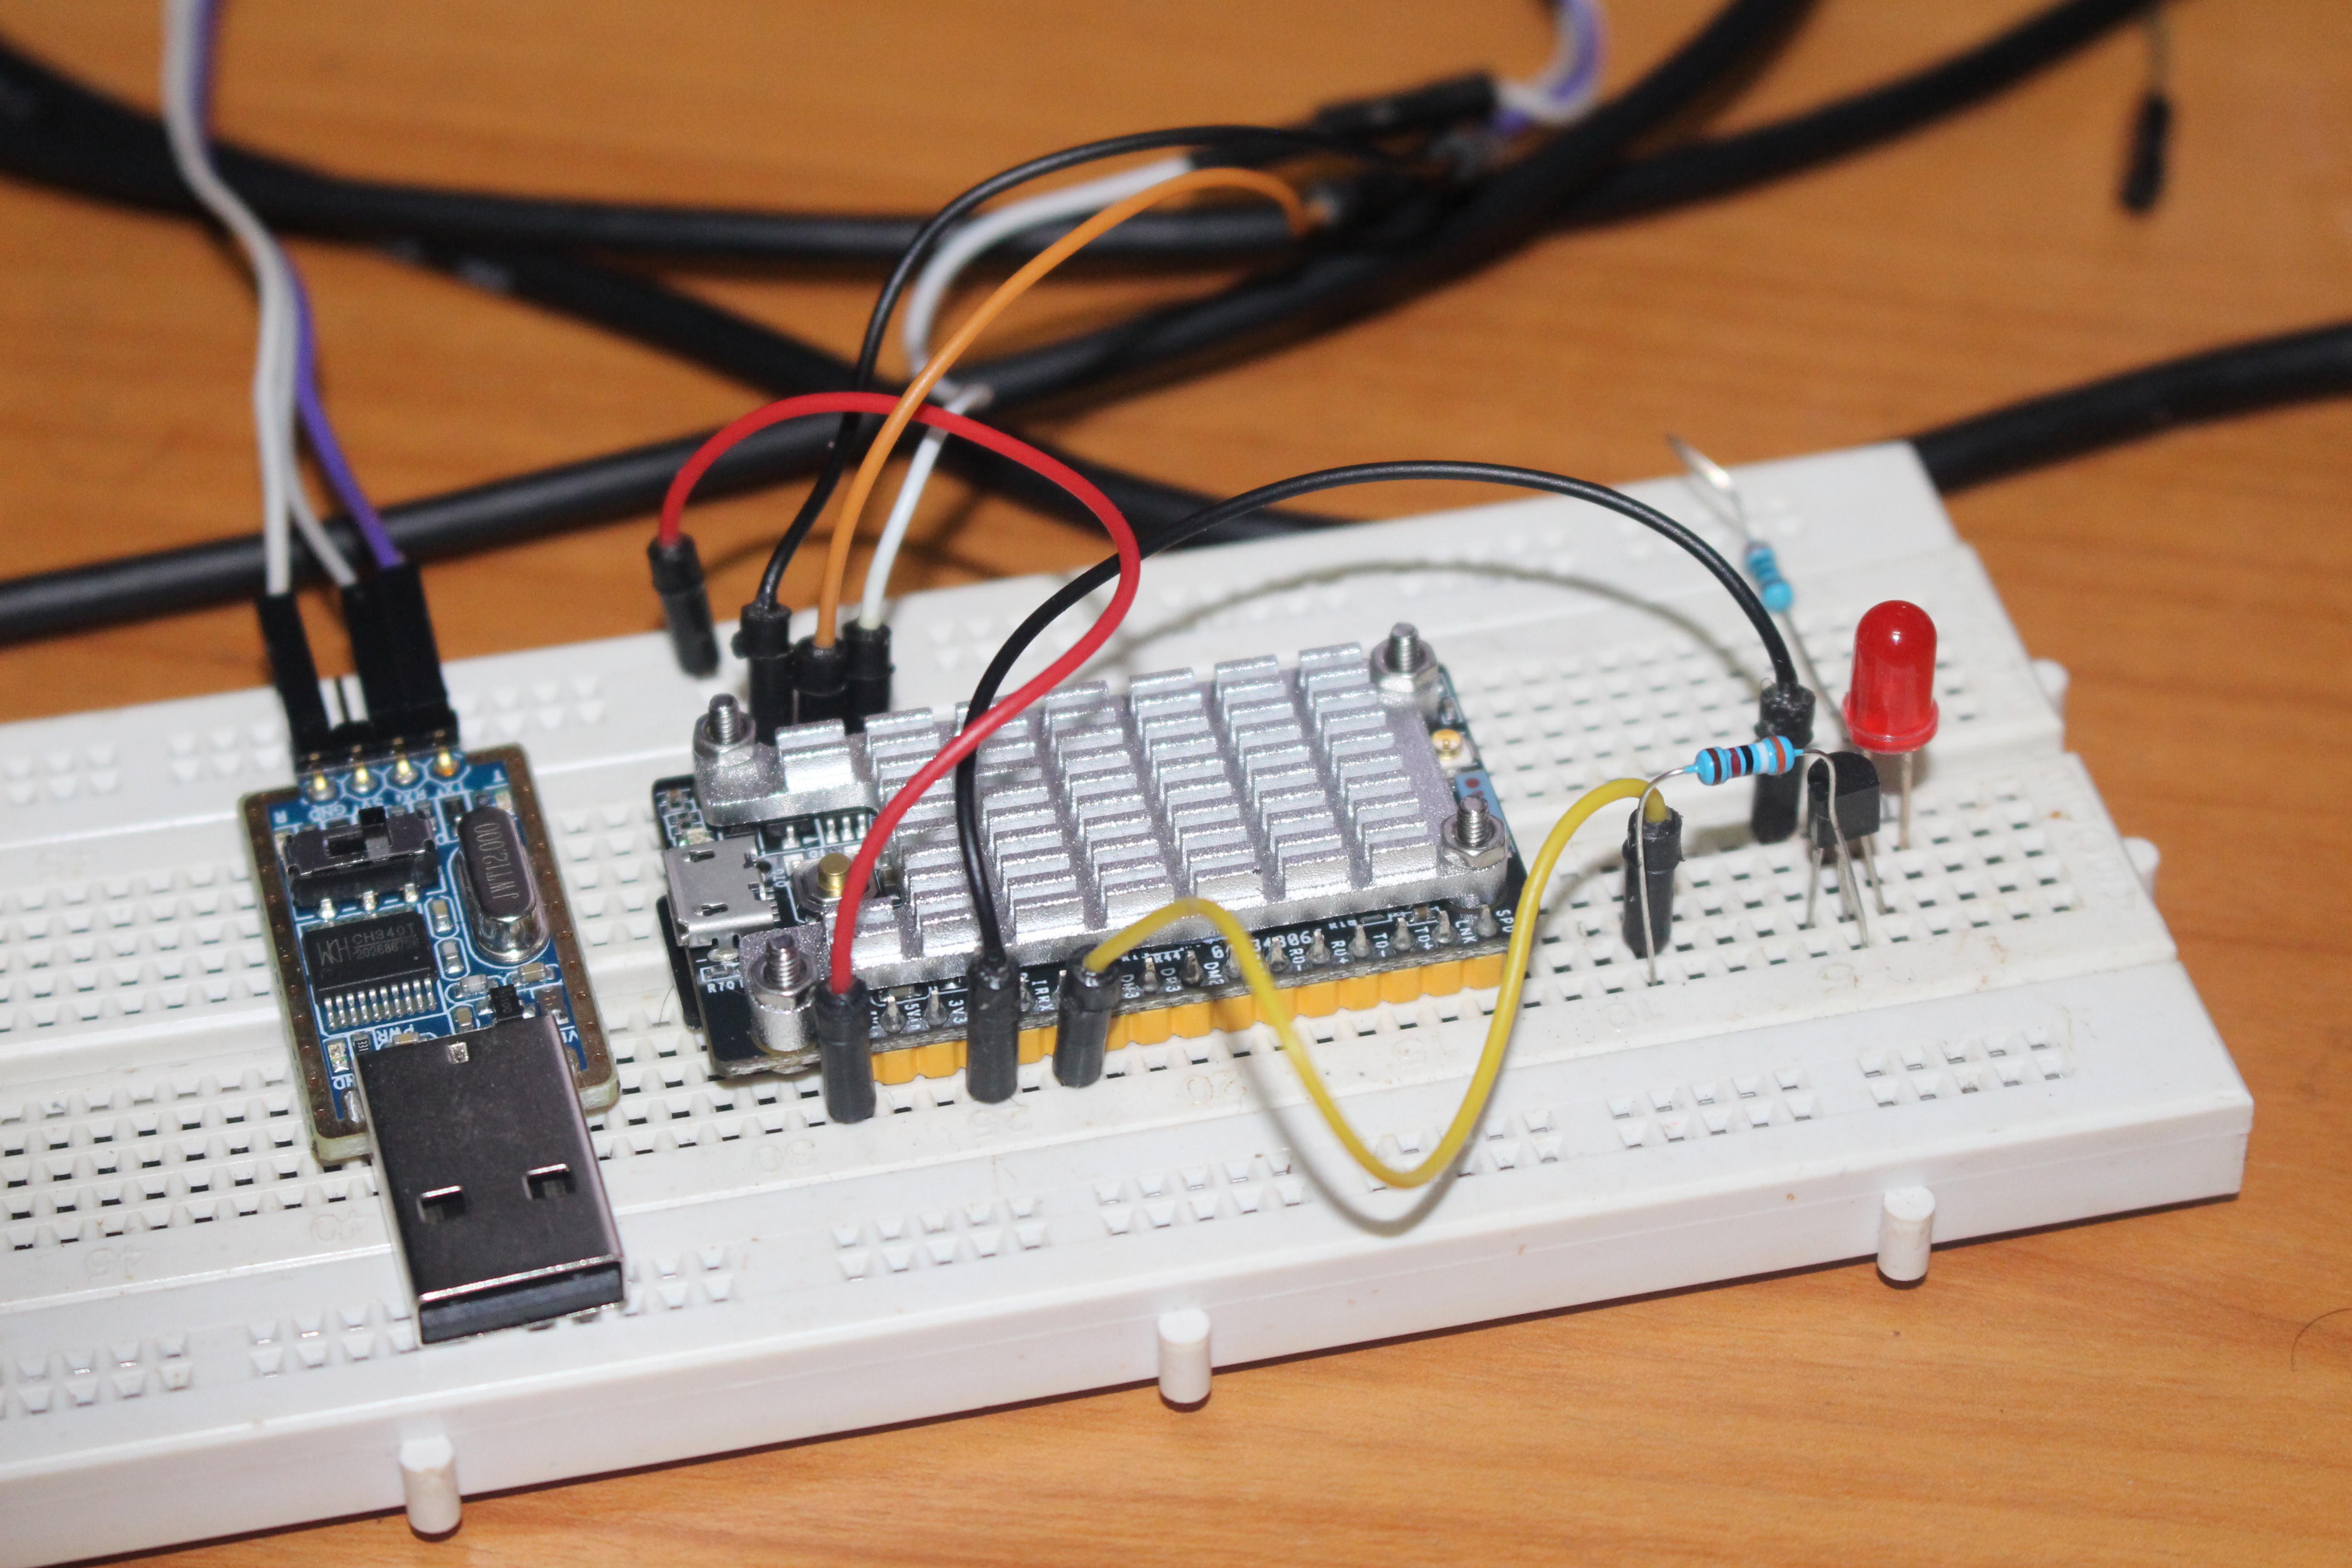 Nanopi Duo Quick Start Guide Ubuntu Breadboard Mini Shield Wiringpi Install Click To Enlarge